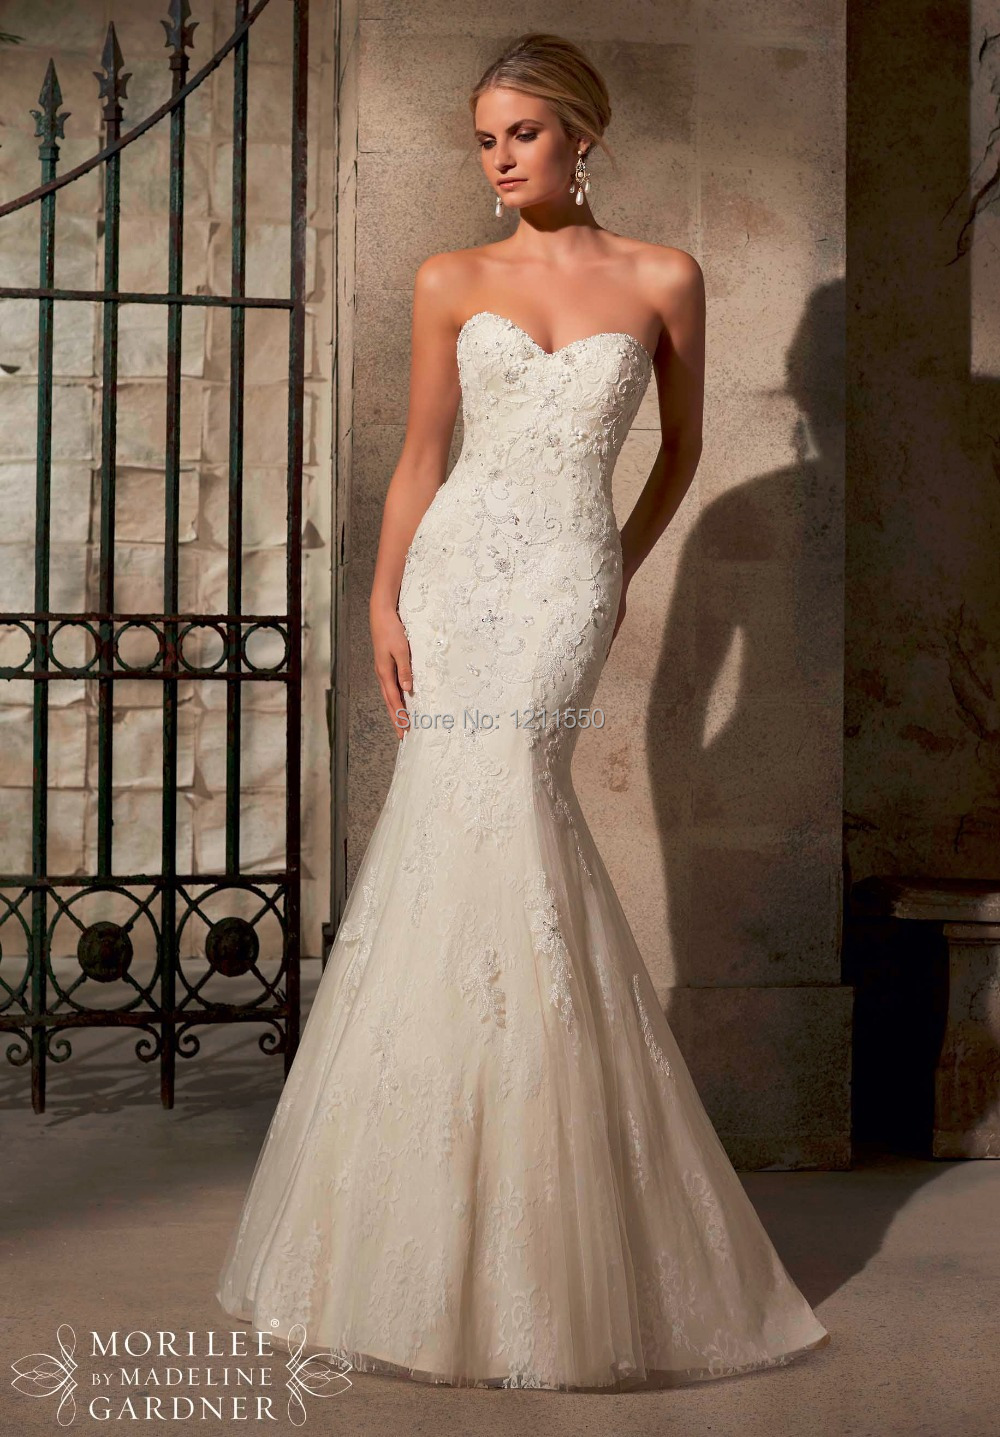 ca weddingdress wedding dress shop online Strapless Tulle Wedding Dress with Lace Applique Style WG